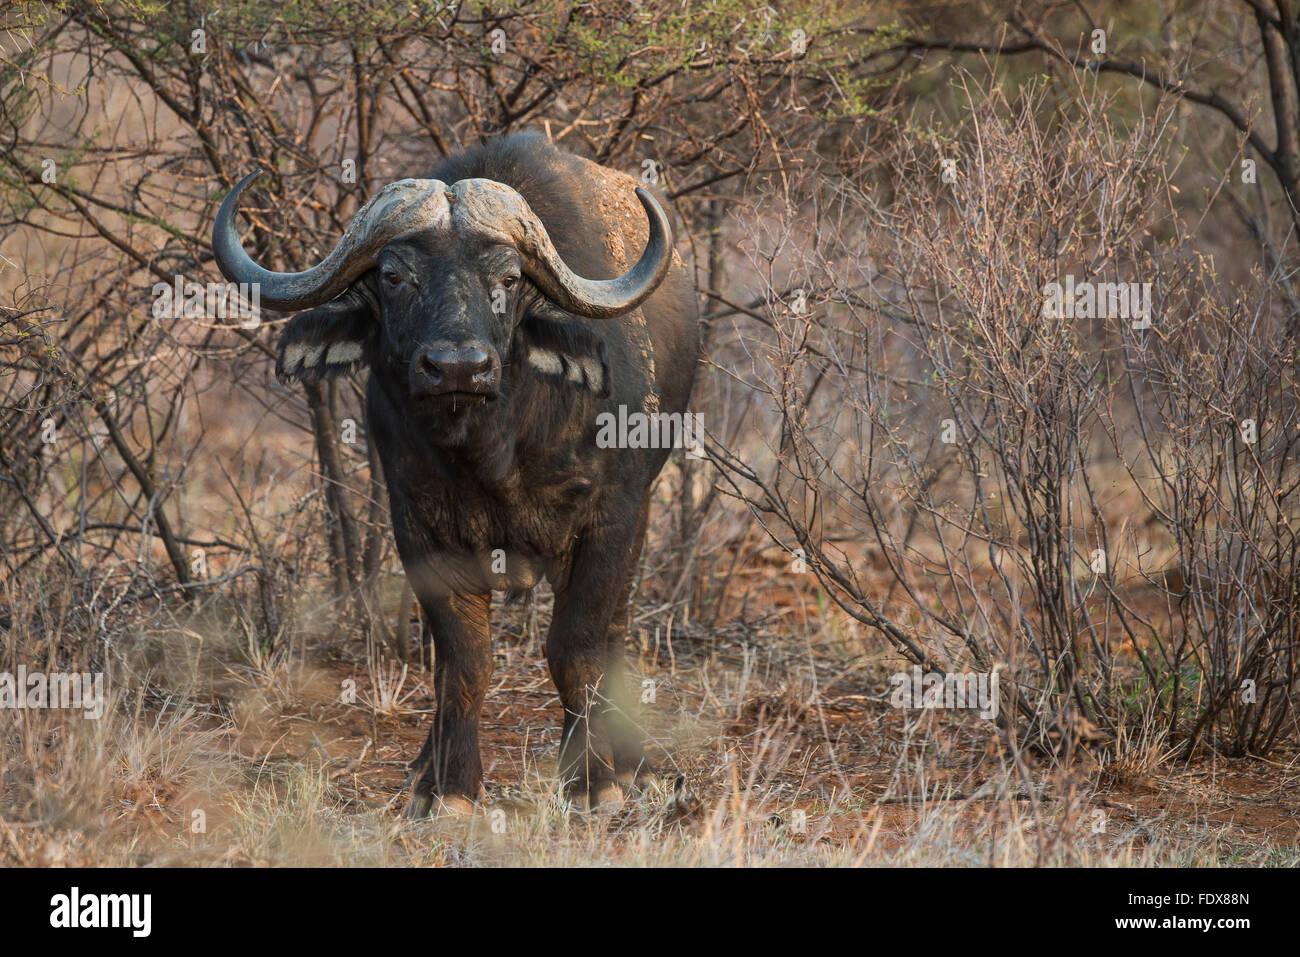 O el cabo africano (Syncerus caffer) Buffalo entre arbustos, Madikwe Game Reserve, Noroeste, Sur África Imagen De Stock